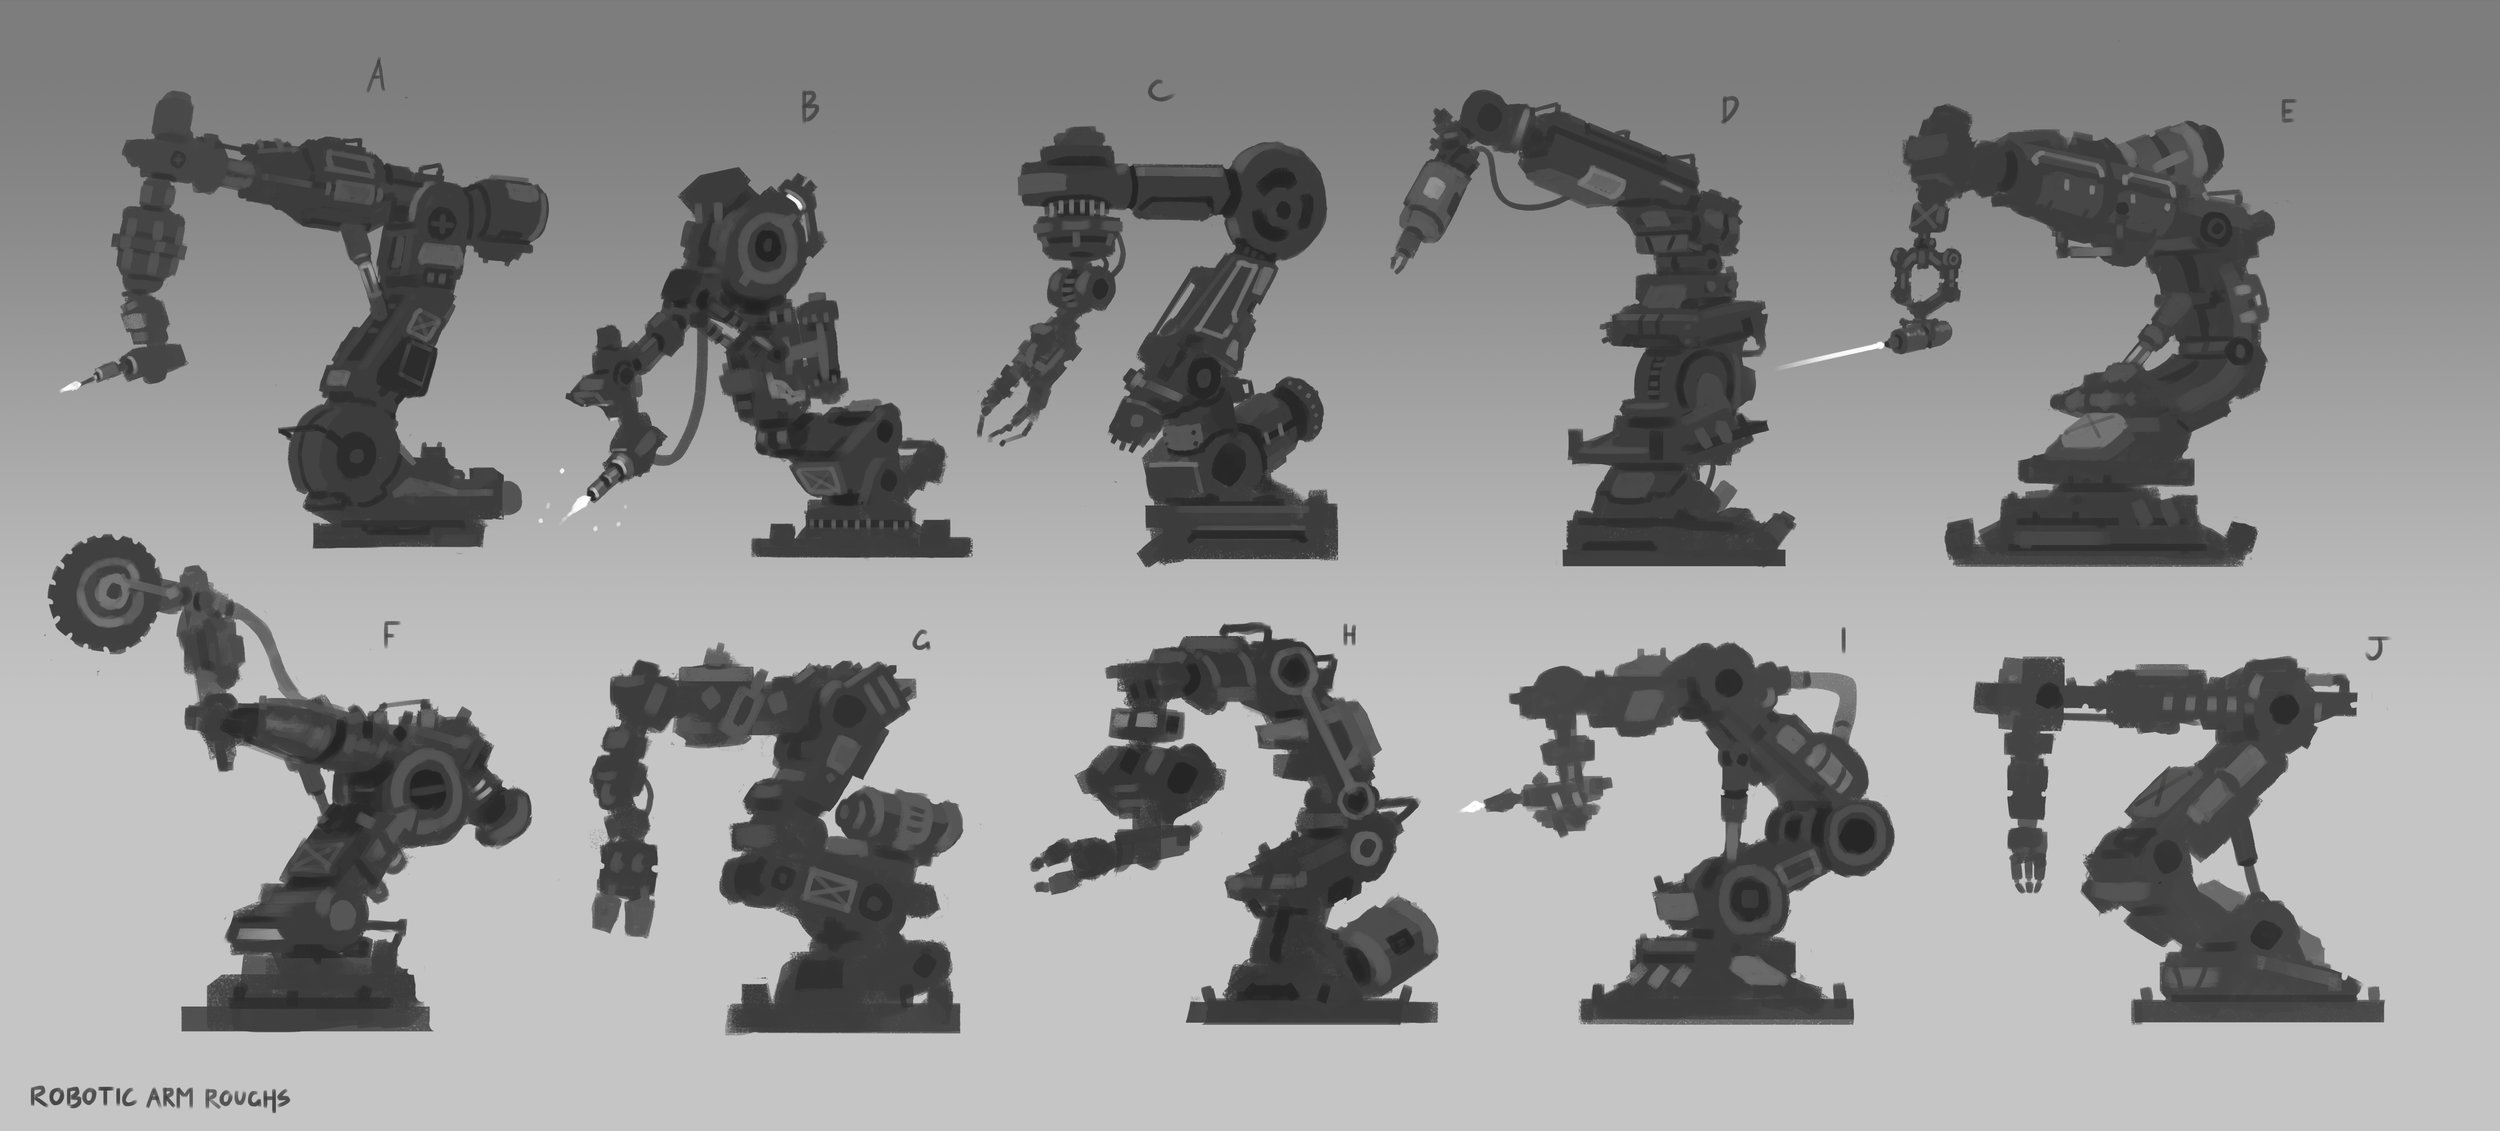 James_Chao_Robotic_Arm_Sketches